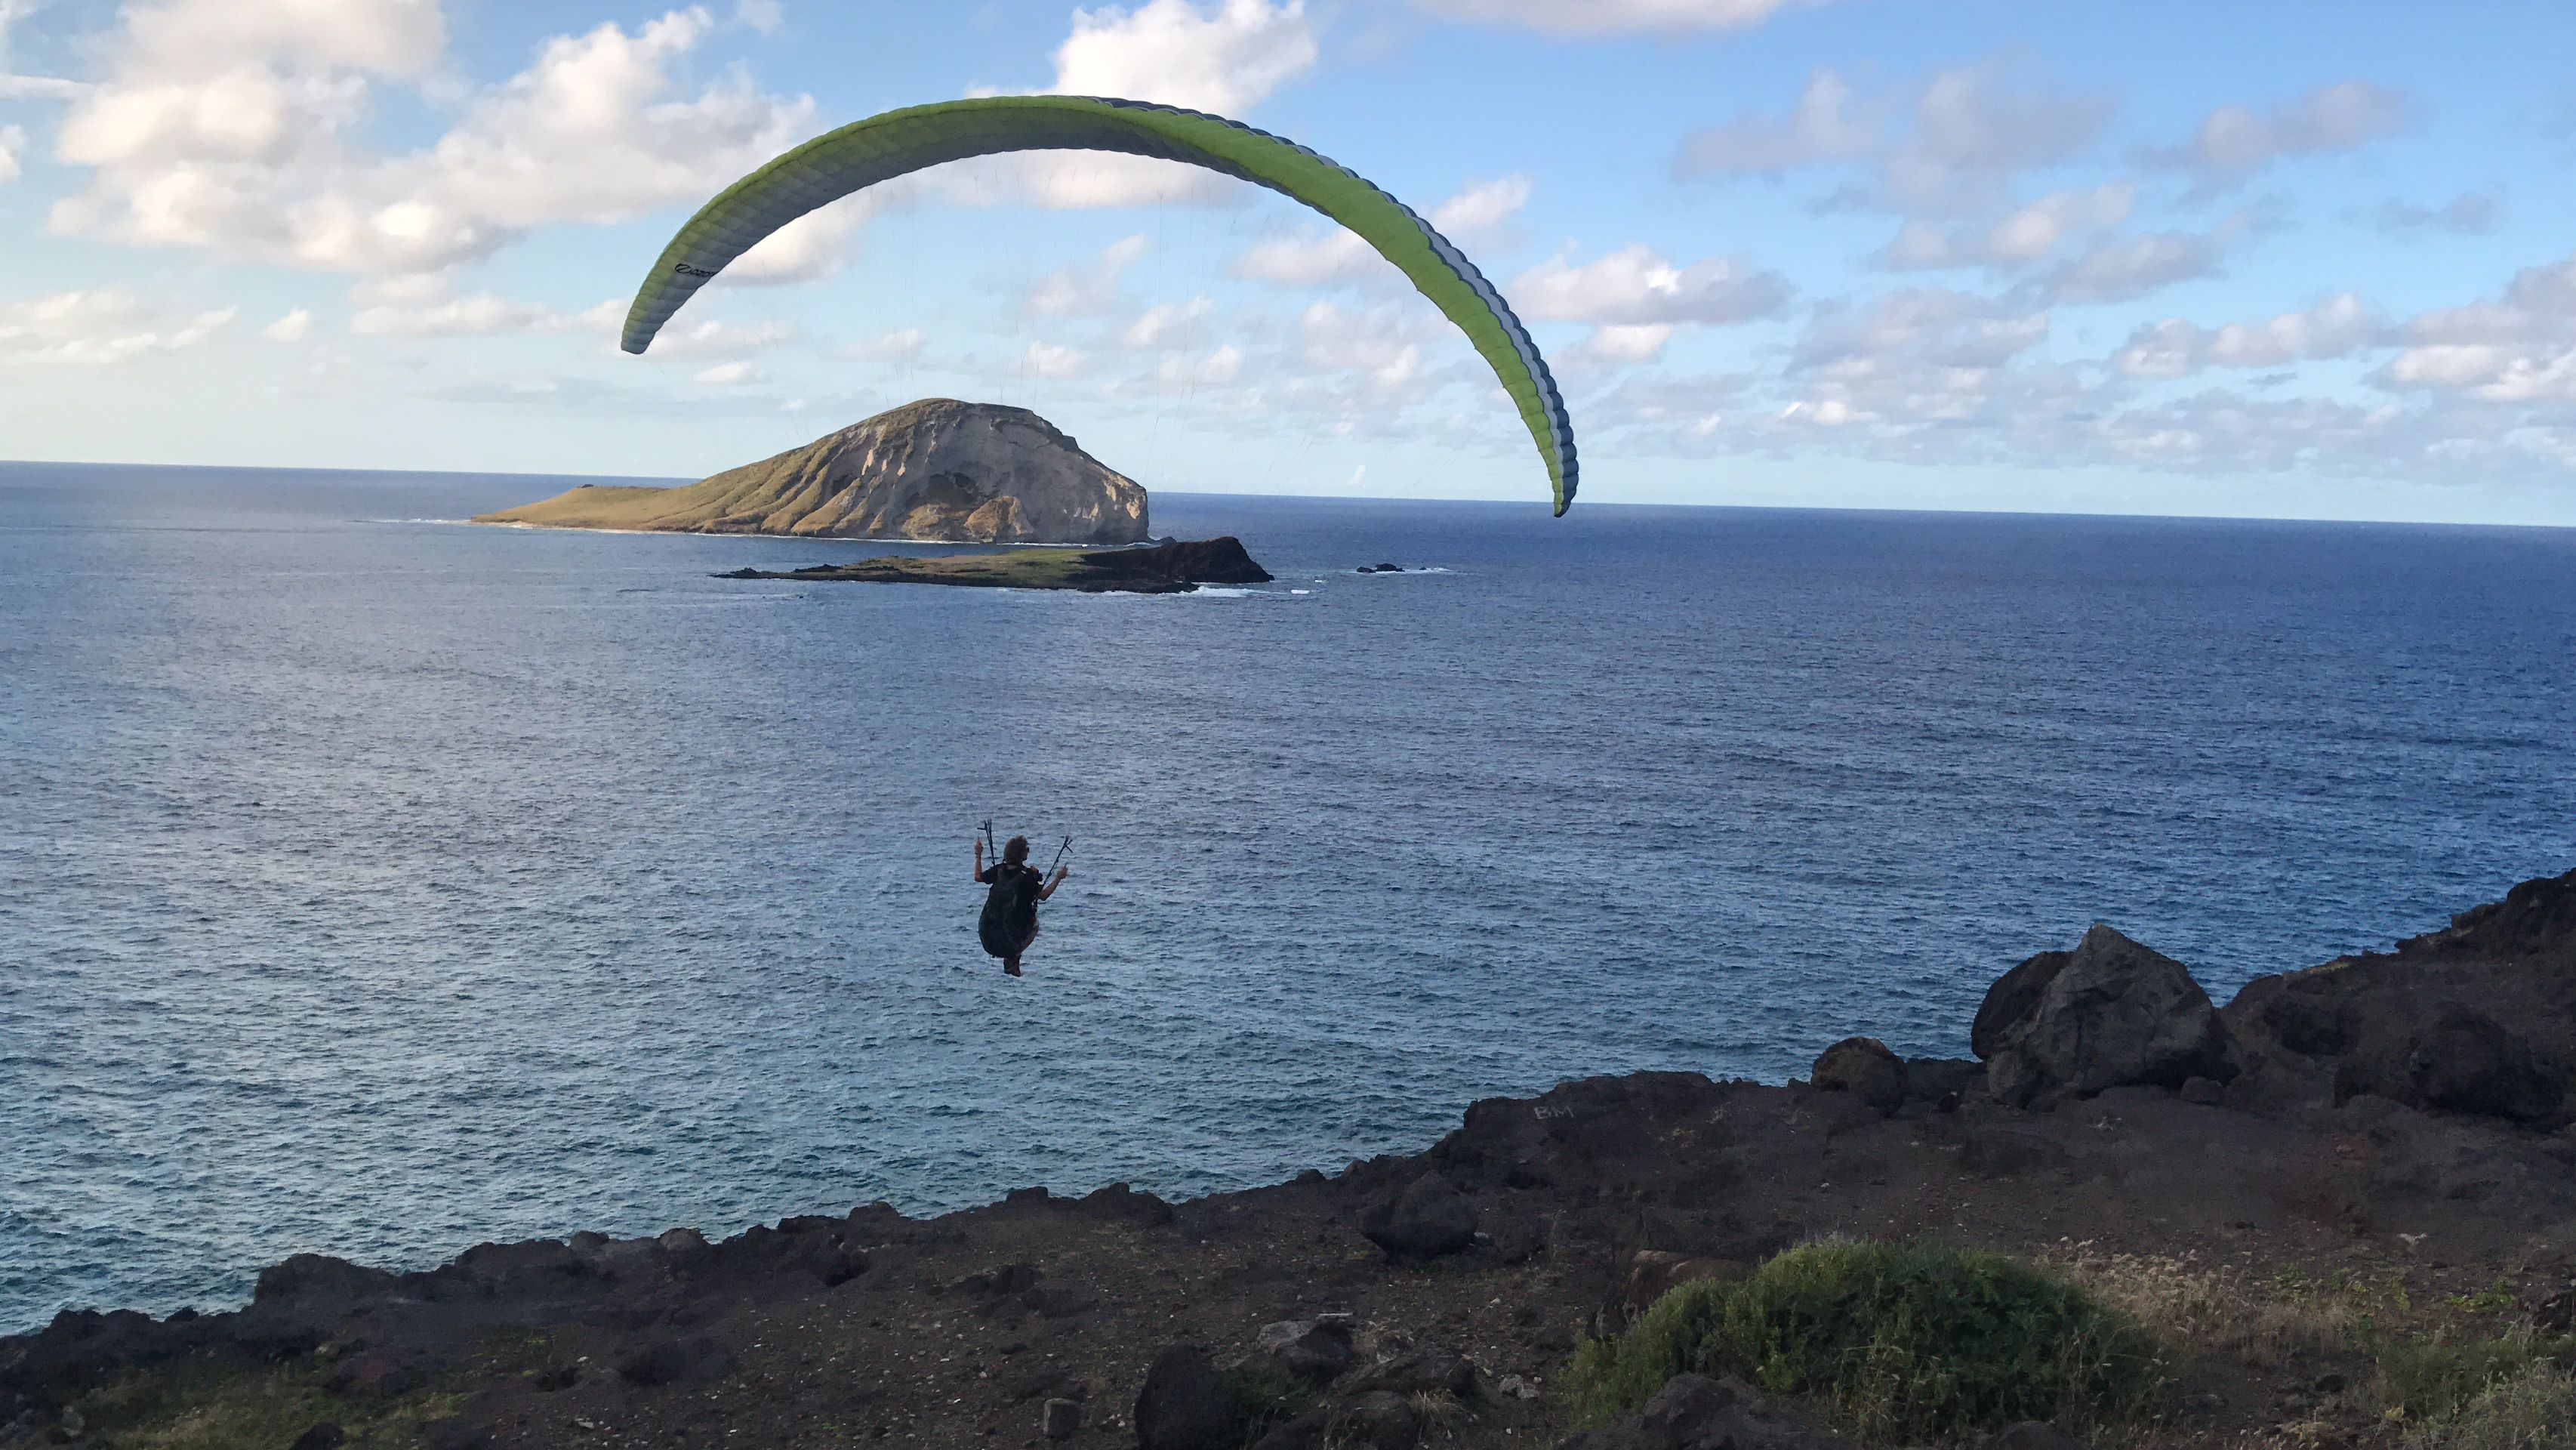 #parasailing #hawaii #oahu - tour the island with us http://danielshawaii.com